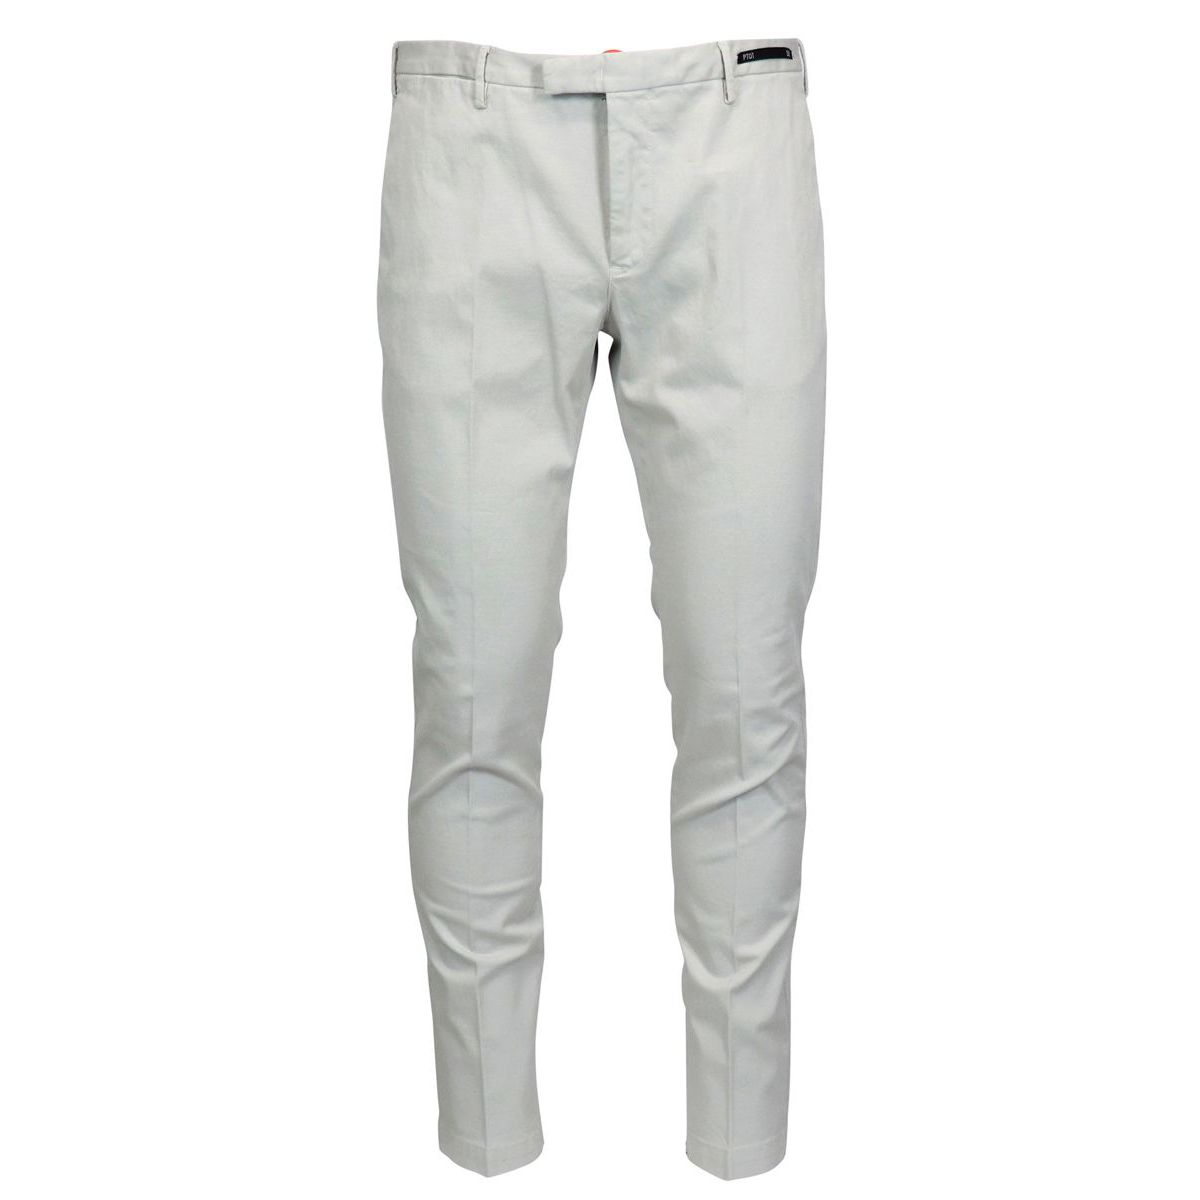 Solid color cotton skinny pants Light grey PT01